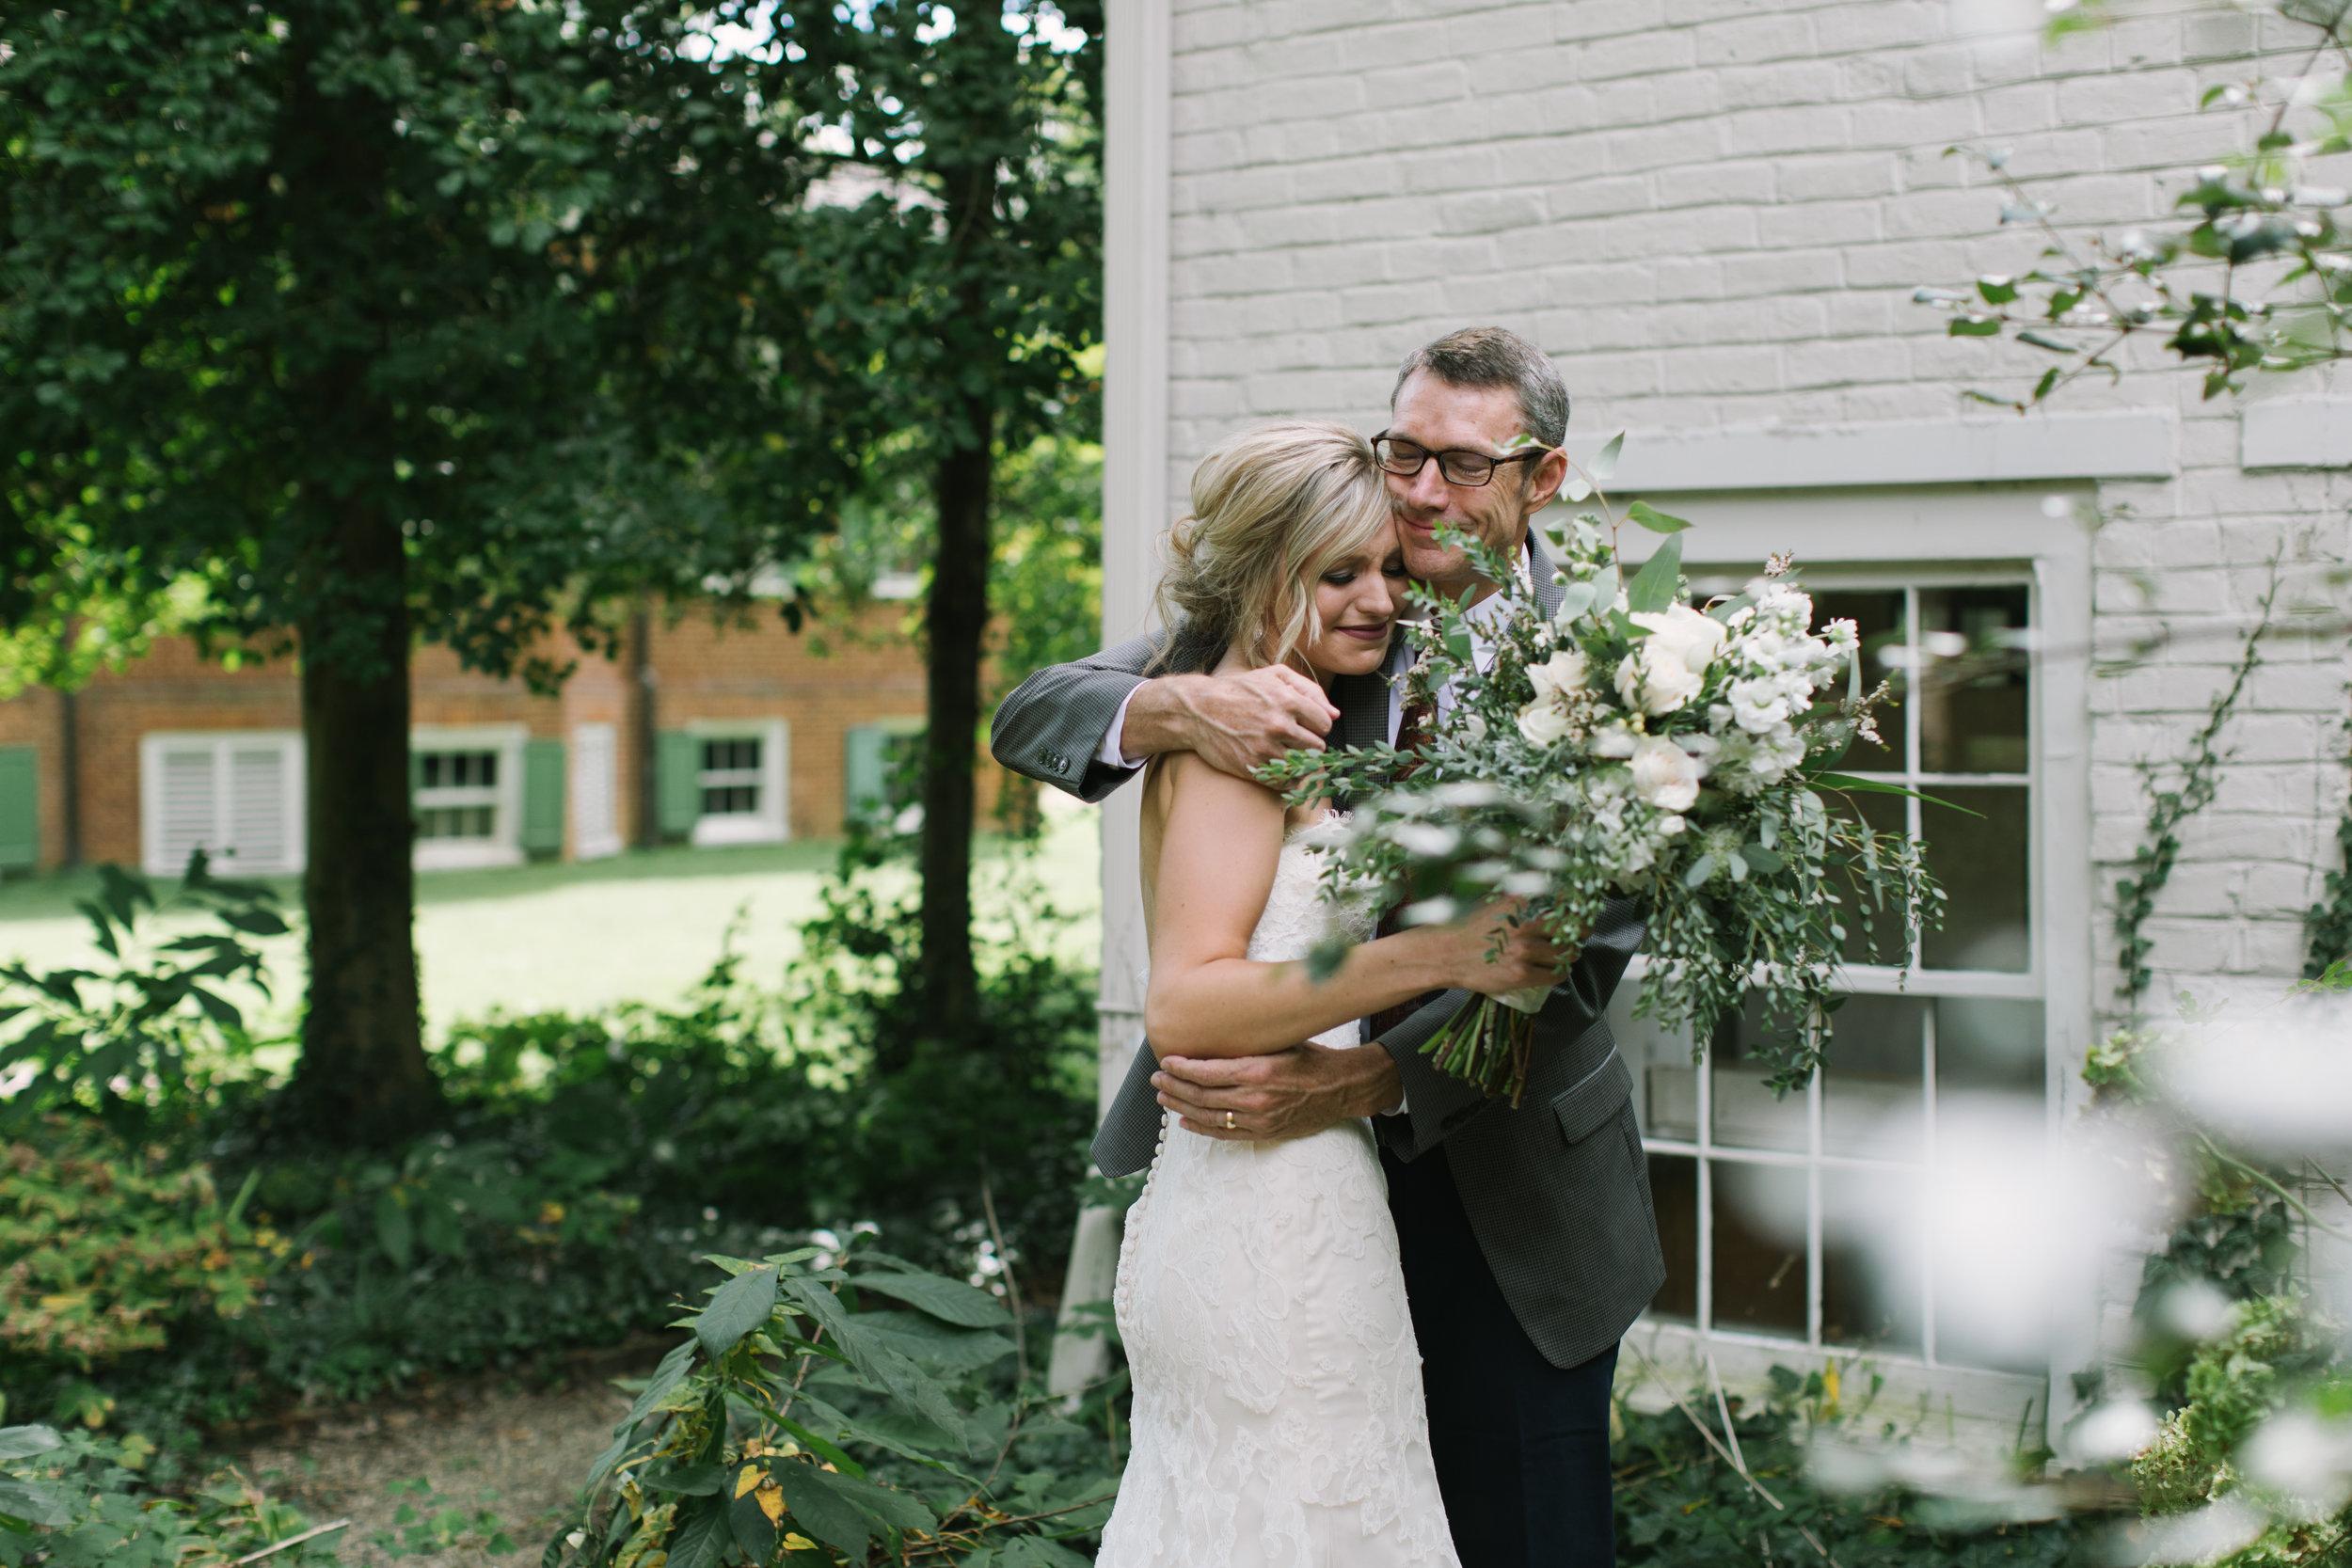 farmington.kentucky.wedding.trent.and.kendra.photography-7.jpg